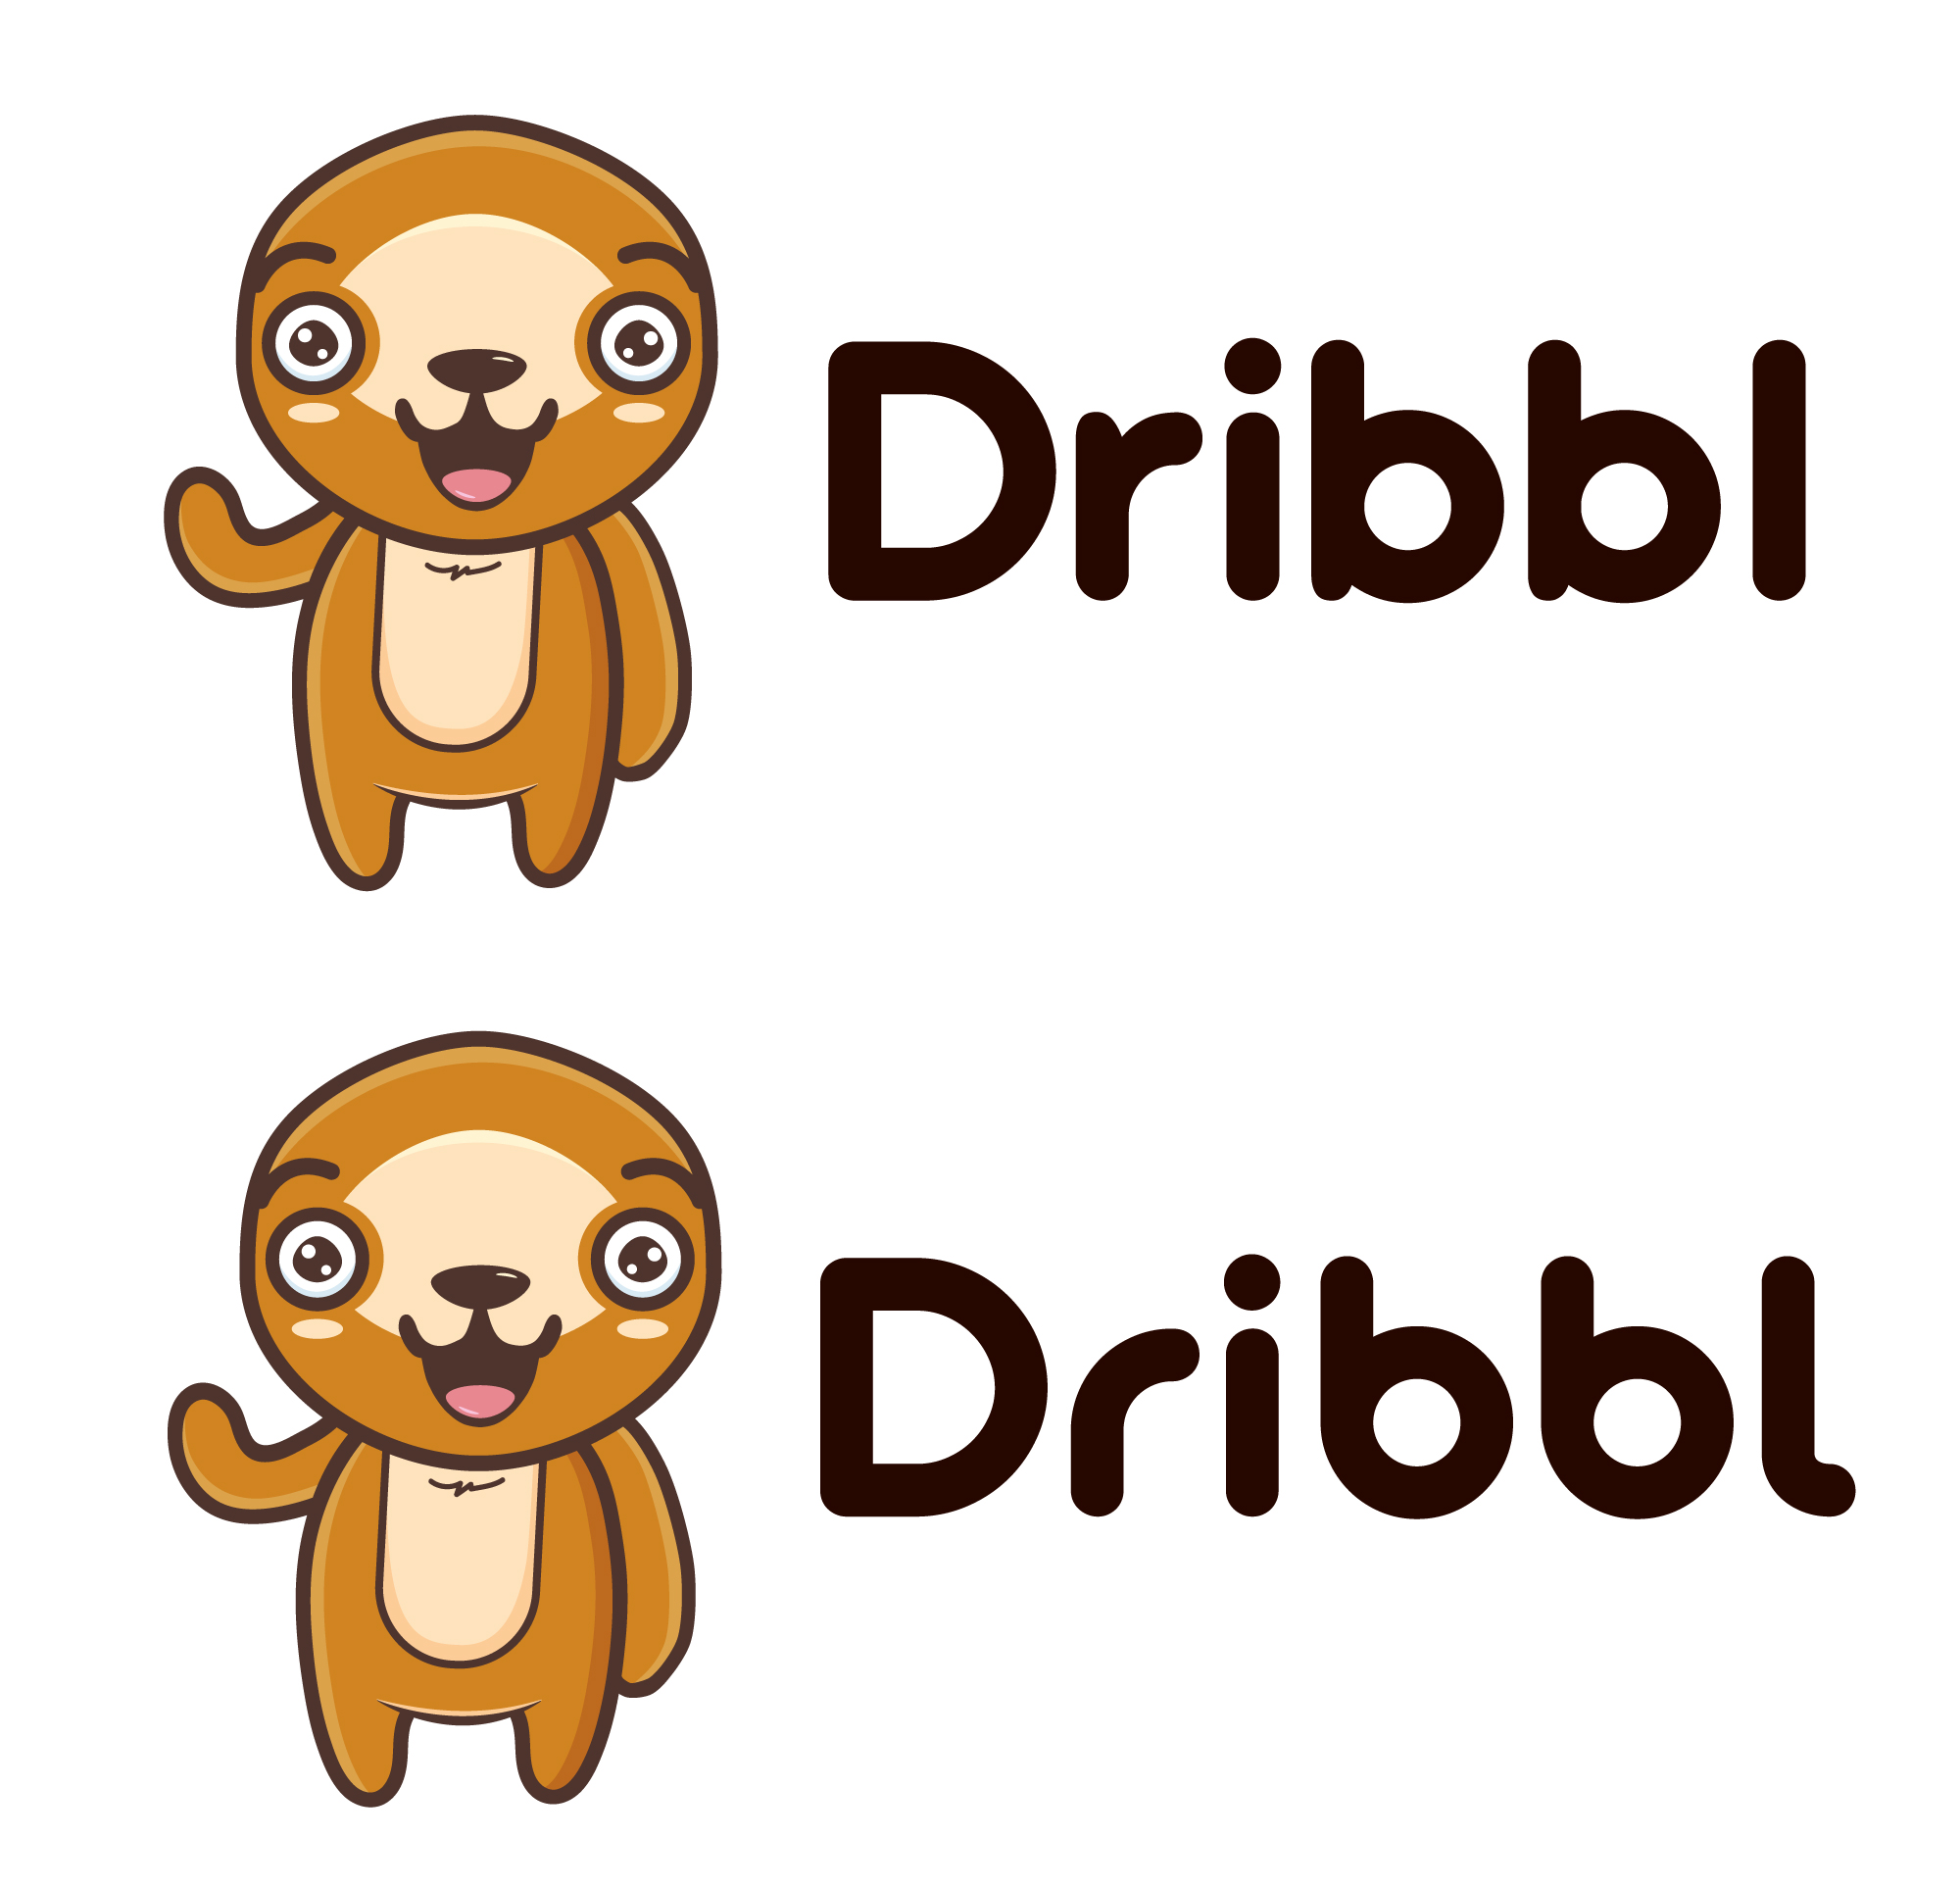 Разработка логотипа для сайта Dribbl.ru фото f_7265a9b588449409.jpg